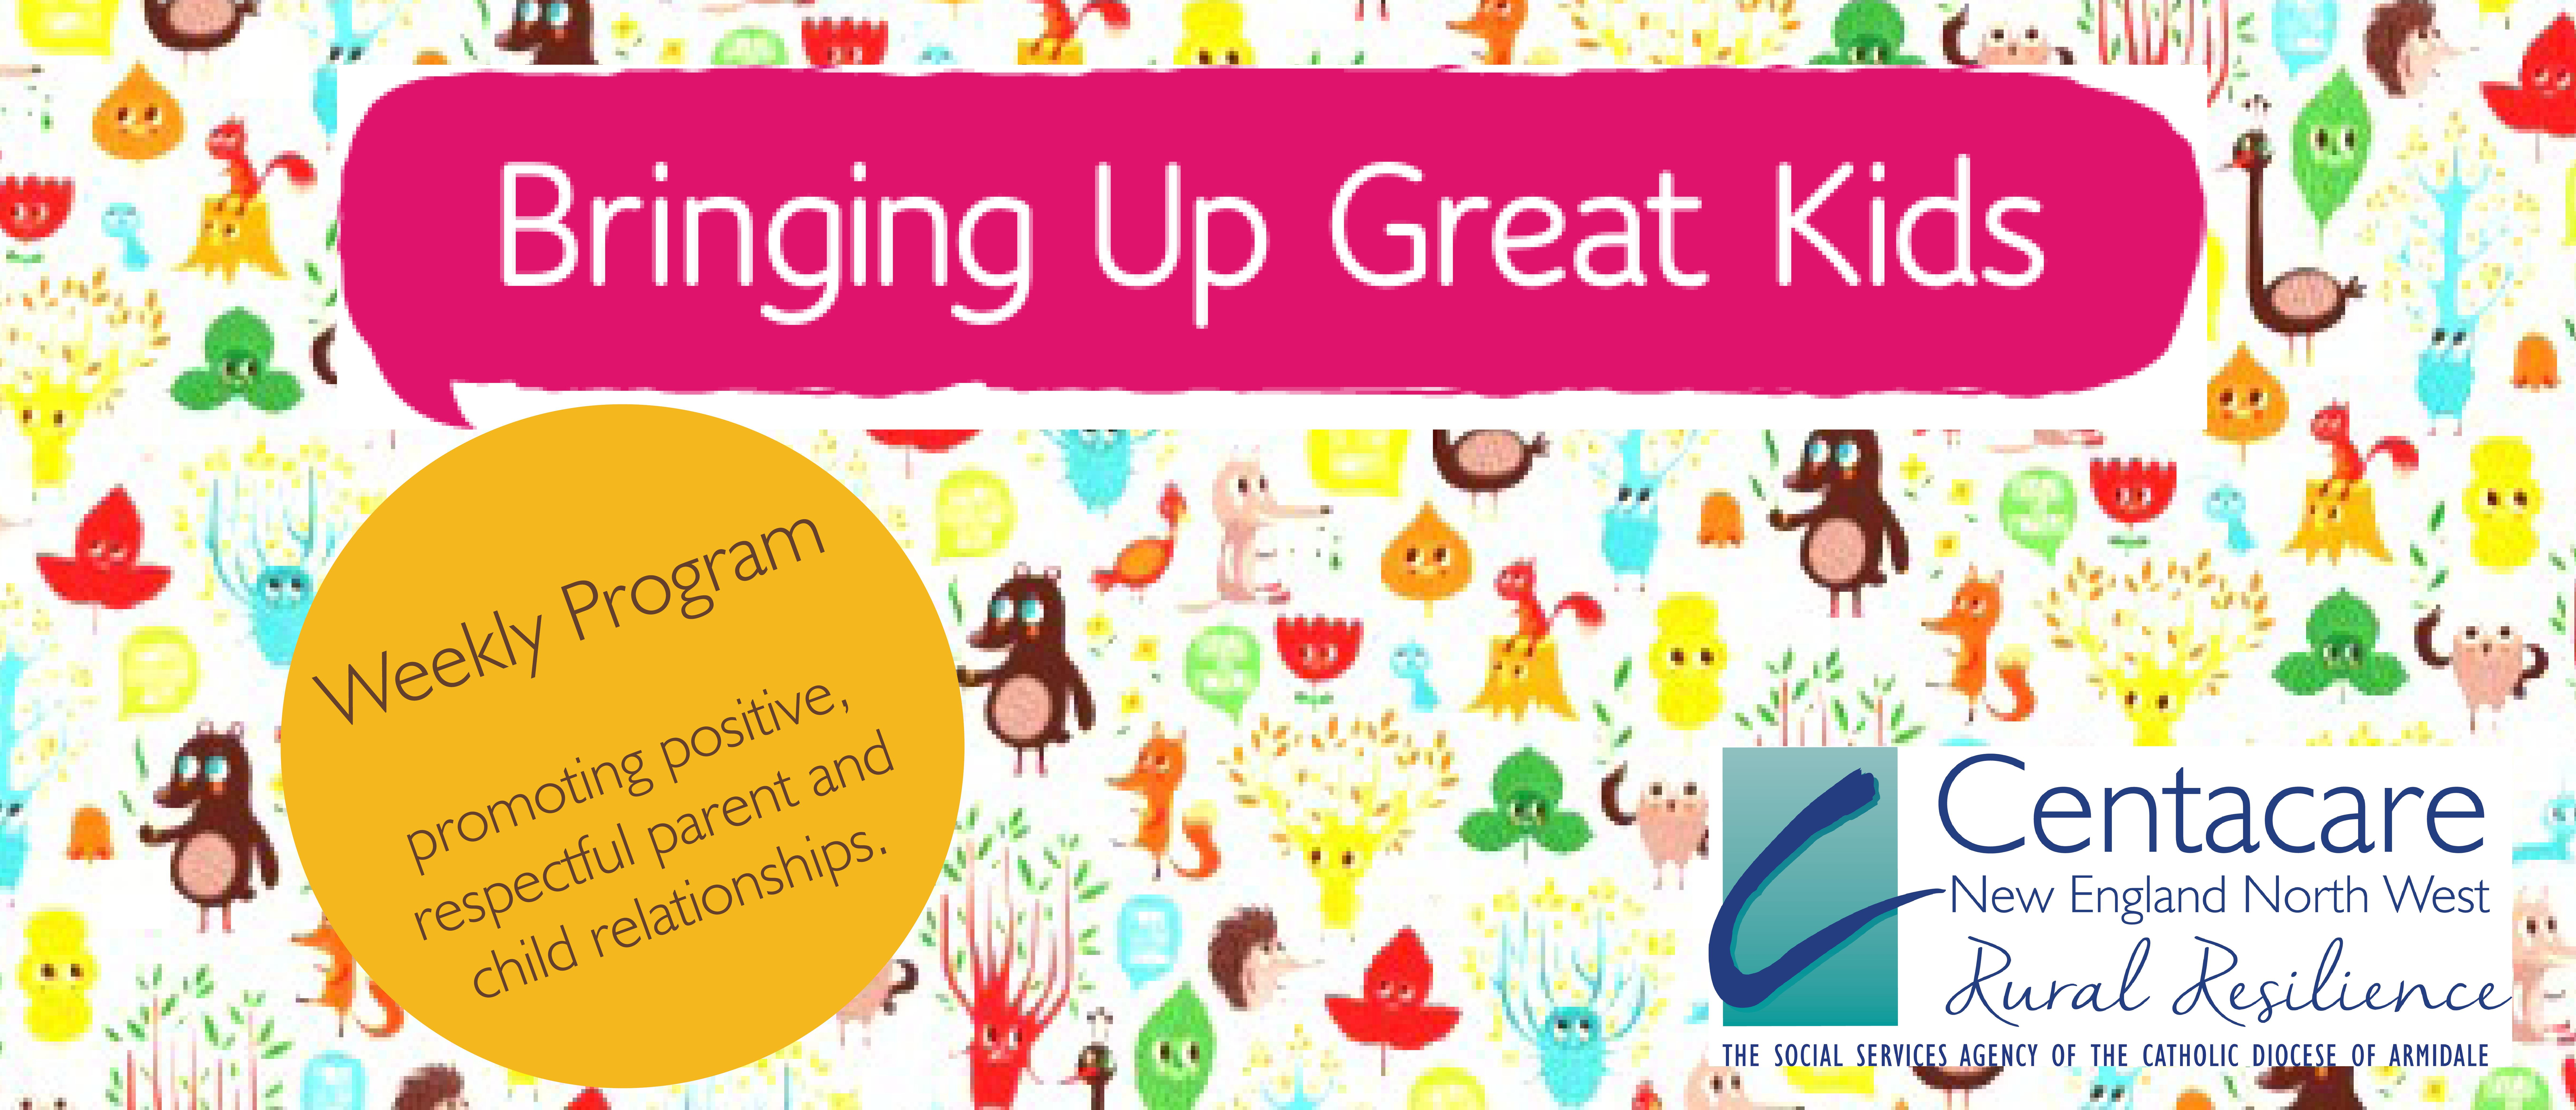 Bringing Up Great Kids - Inverell